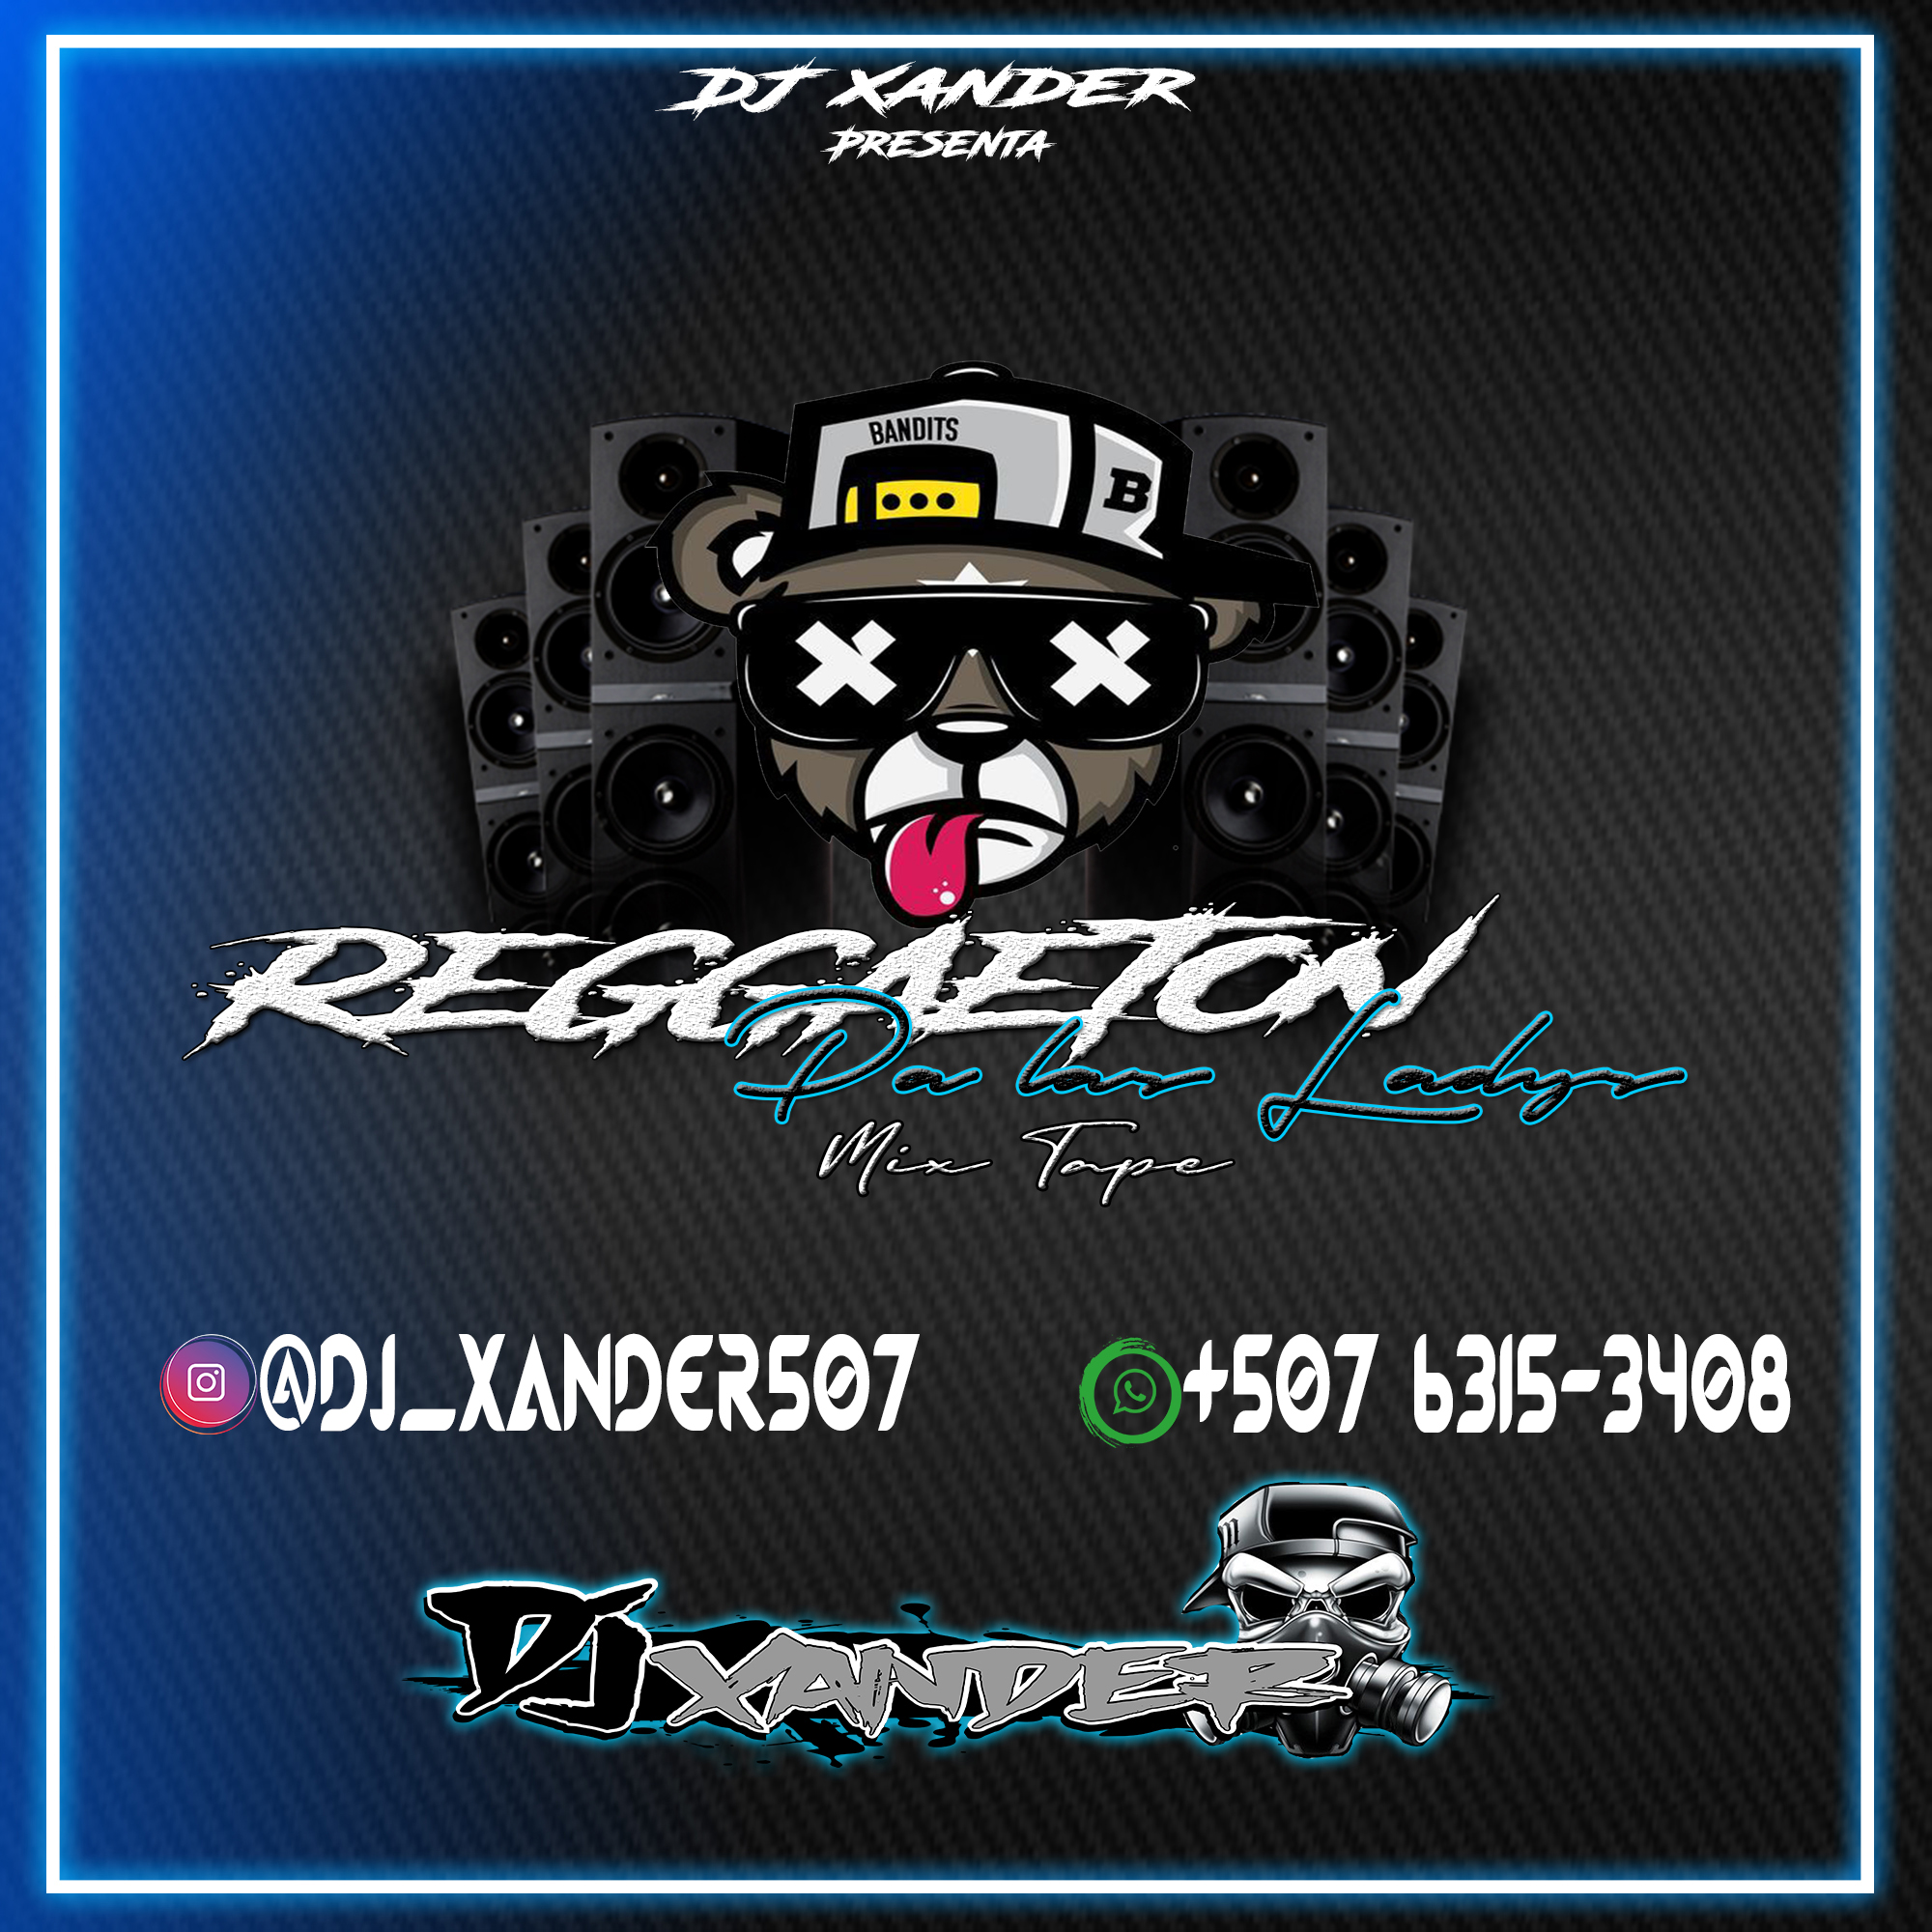 Dj Xander507 - Reggaeton Pa Las Ladys Mix Tape